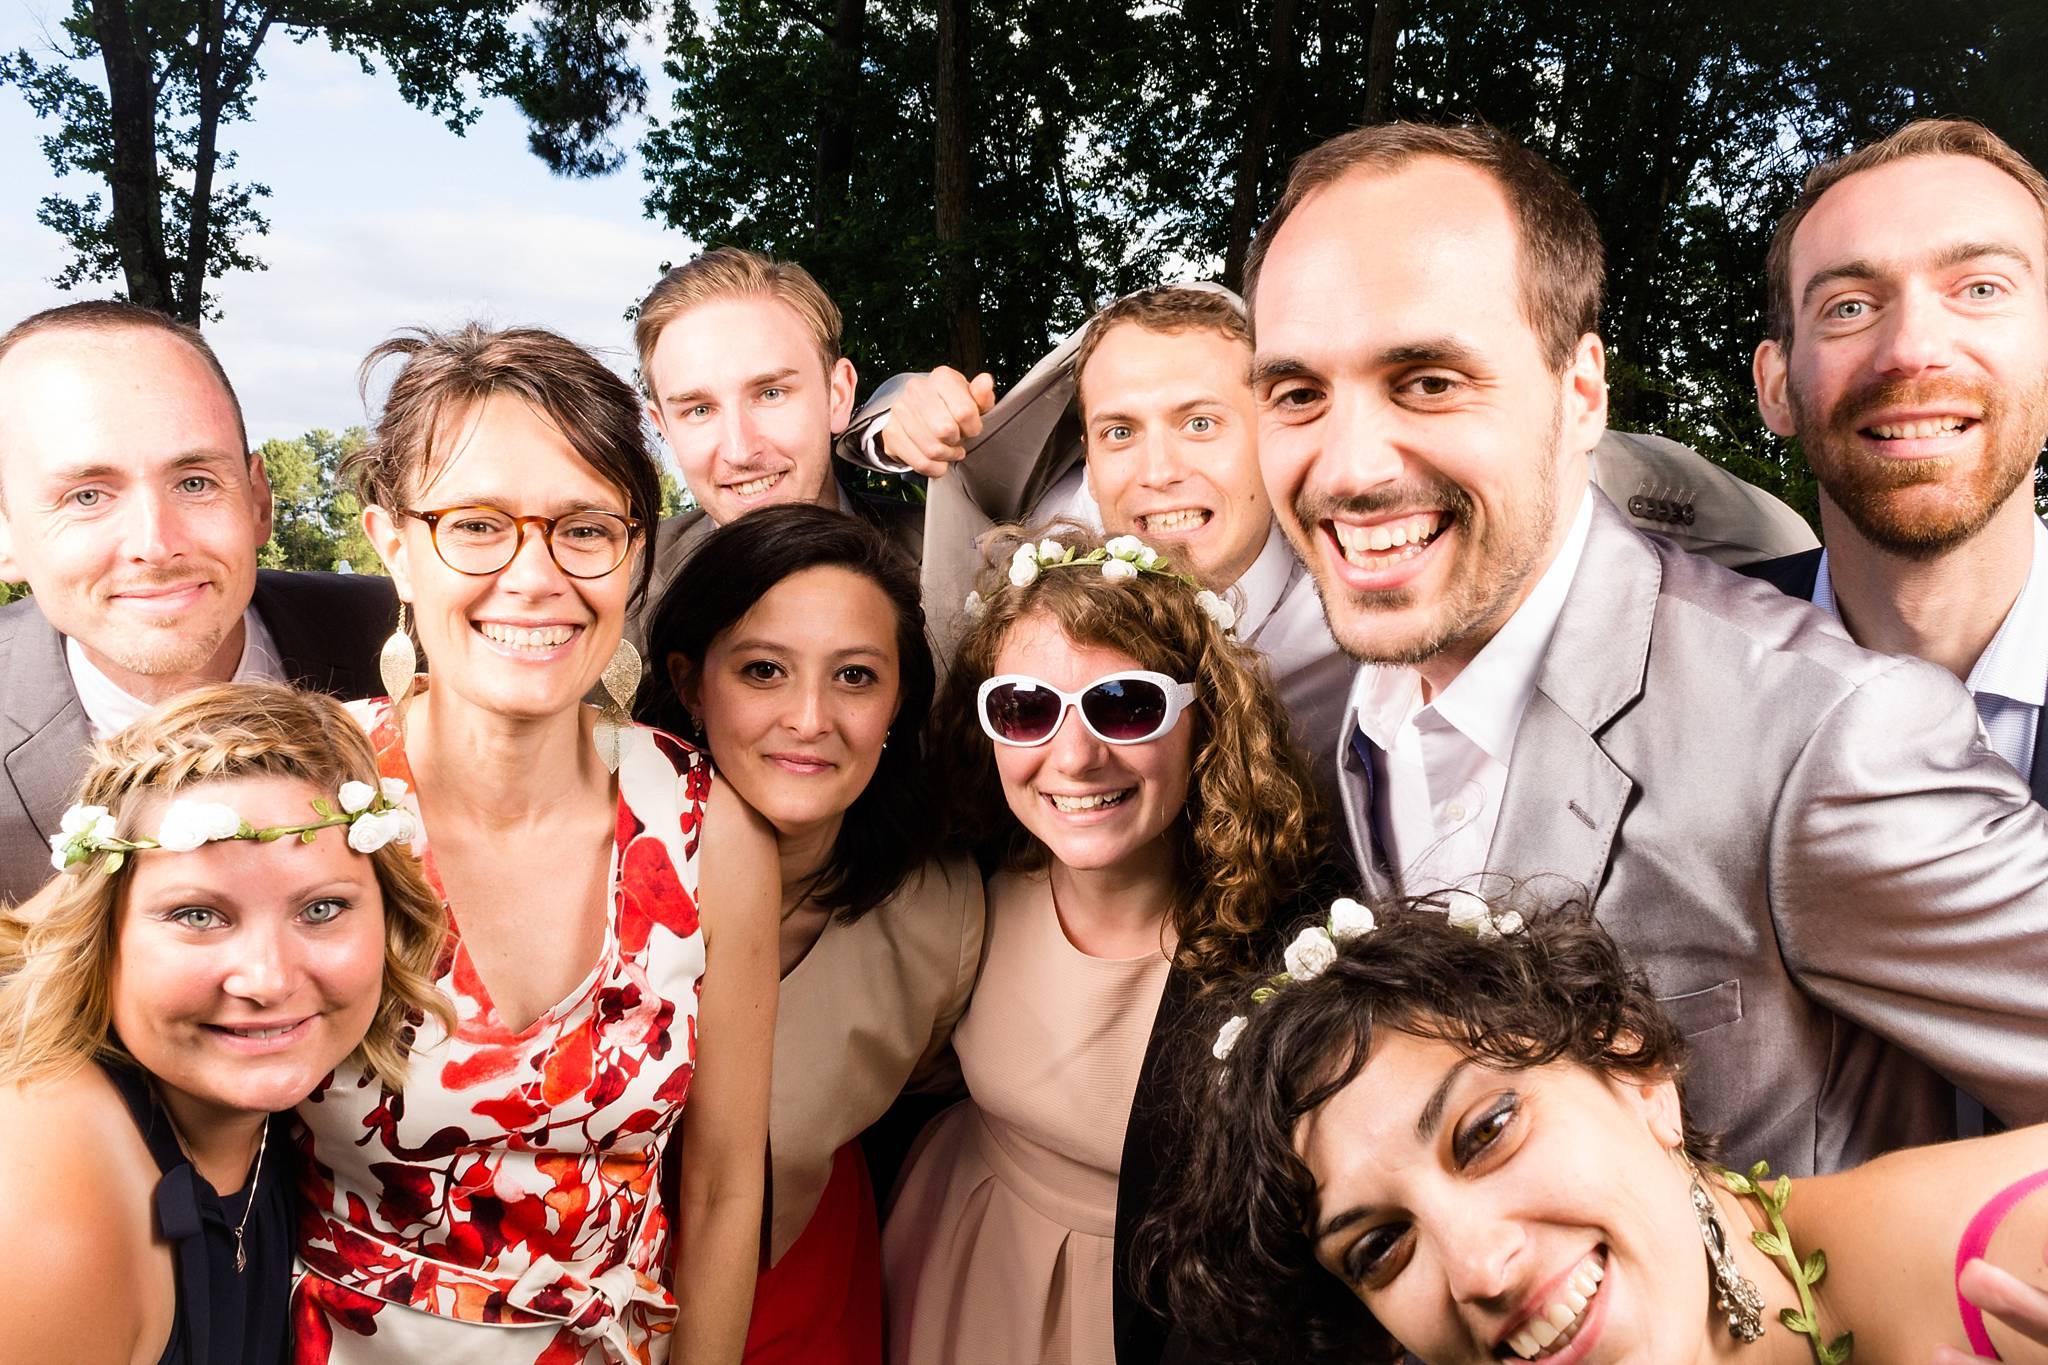 19_photobooth-mariage-bordeaux-gironde-dordogne-charentes-alexandre-roschewitz-photographies_2048px